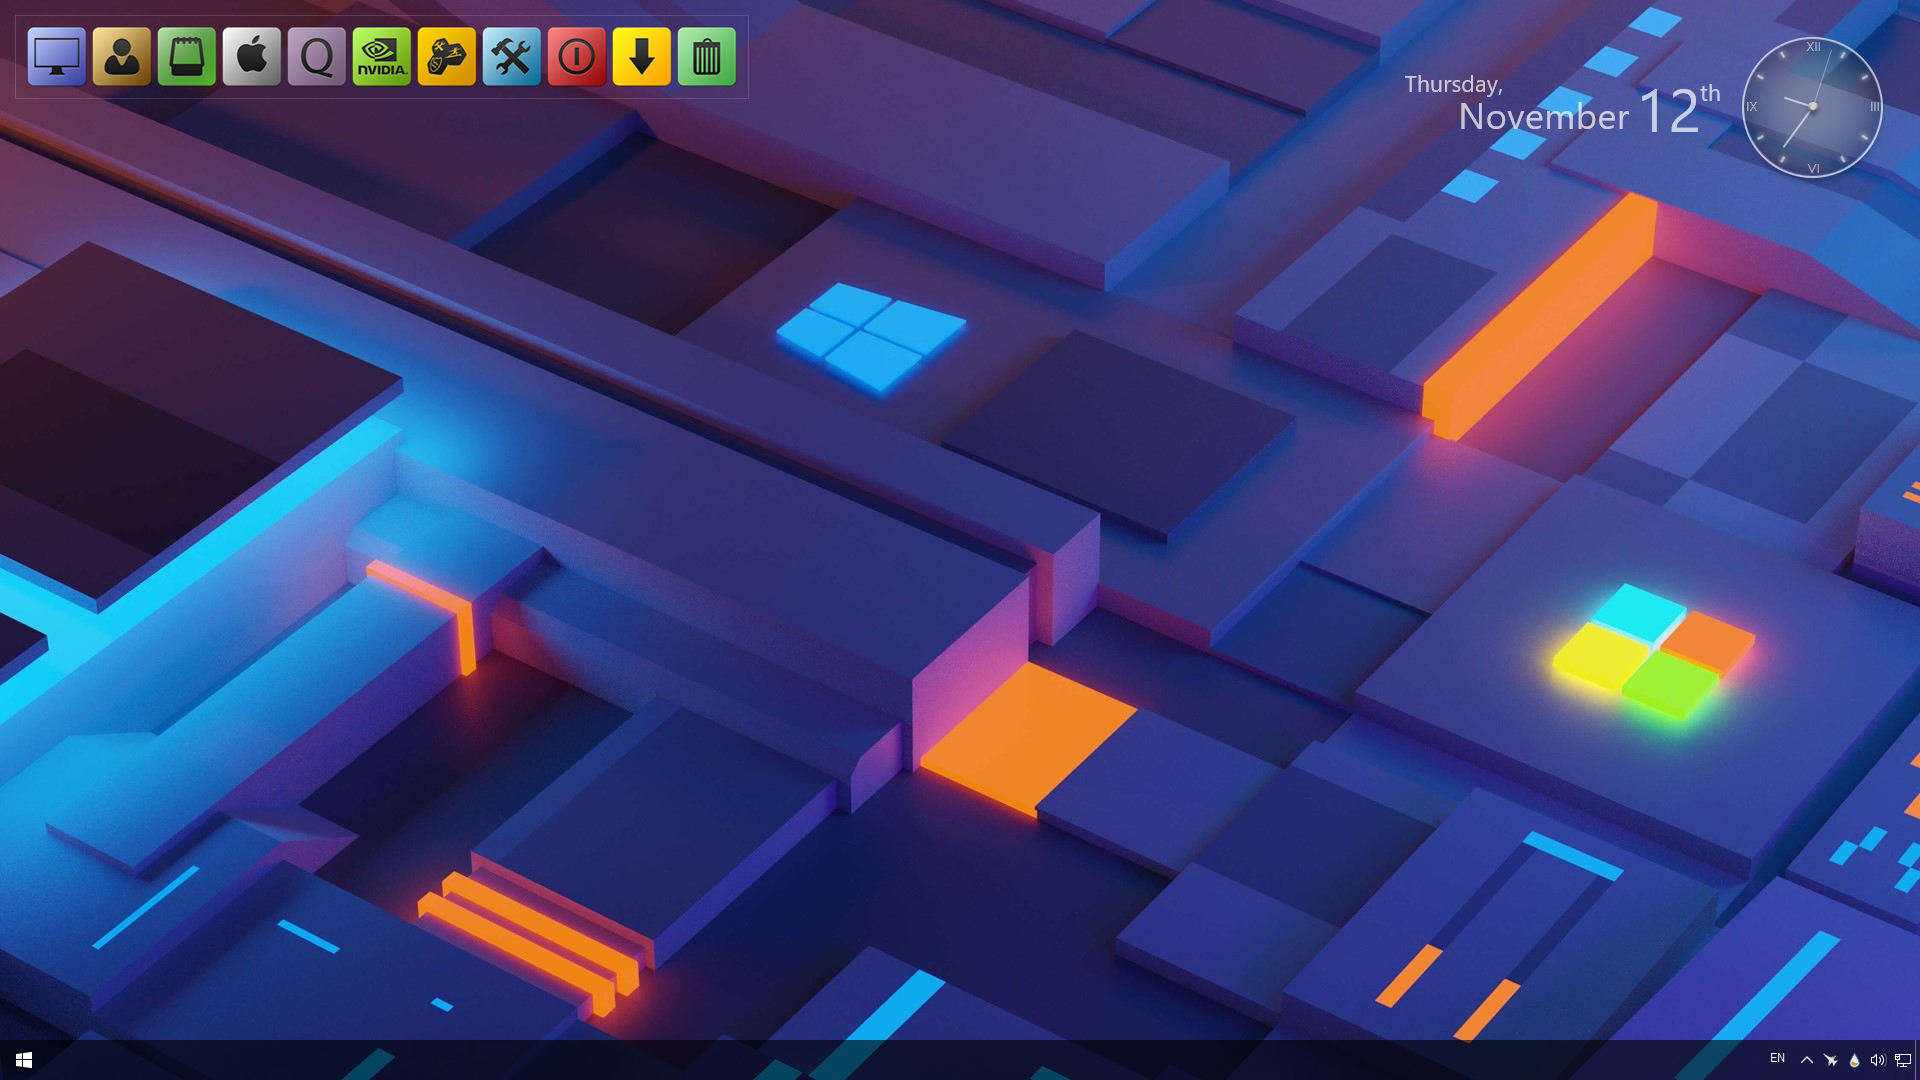 Desktop-2020-11-12-21-36-04-379.png